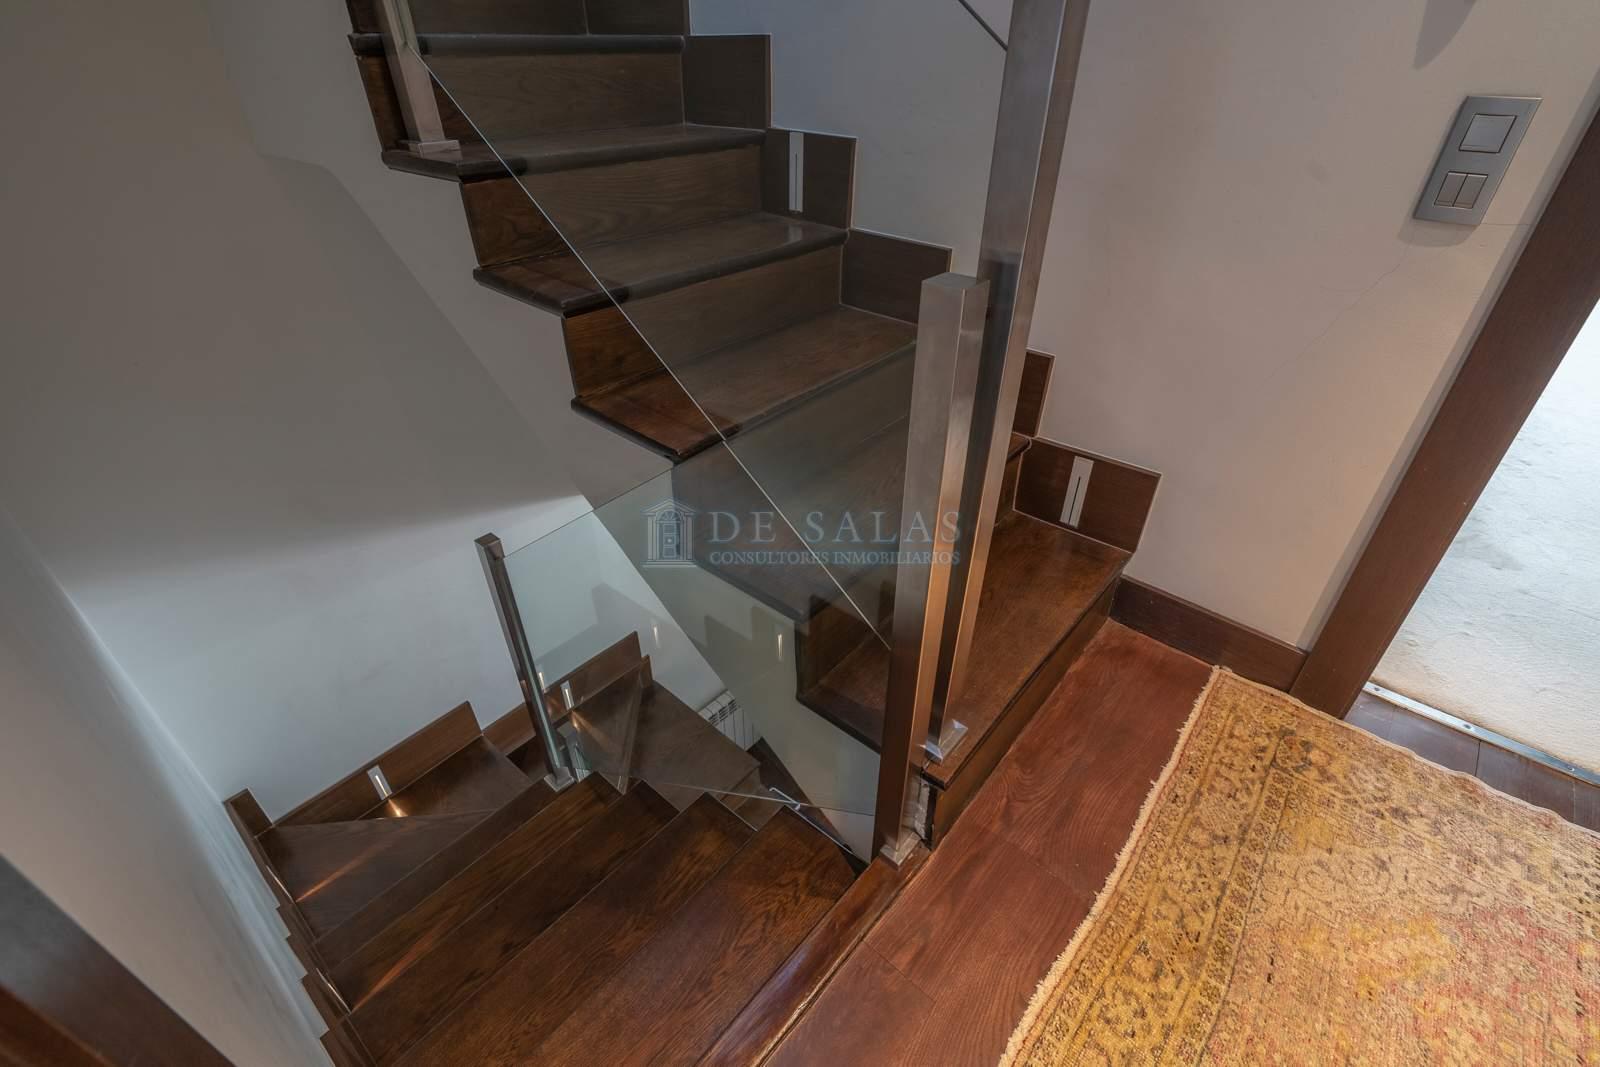 Escalera-22 House Soto de la Moraleja